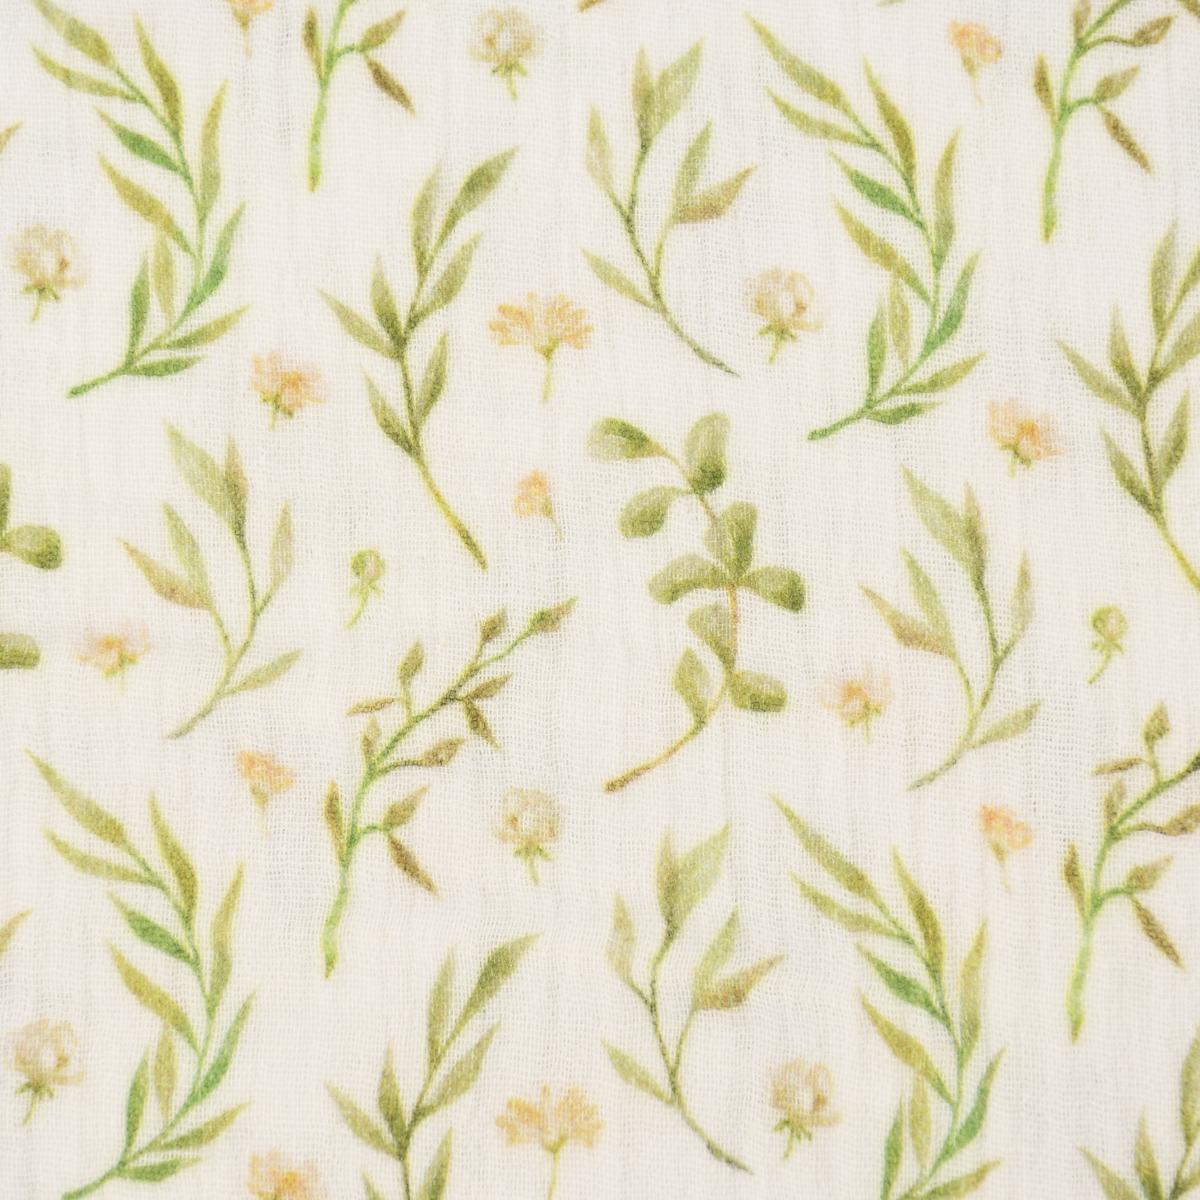 Bekleidungsstoff Musselin Digitaldruck Blumen Bl\u00e4tter offwei\u00df gelb ocker gr\u00fcn 1,30m Breite